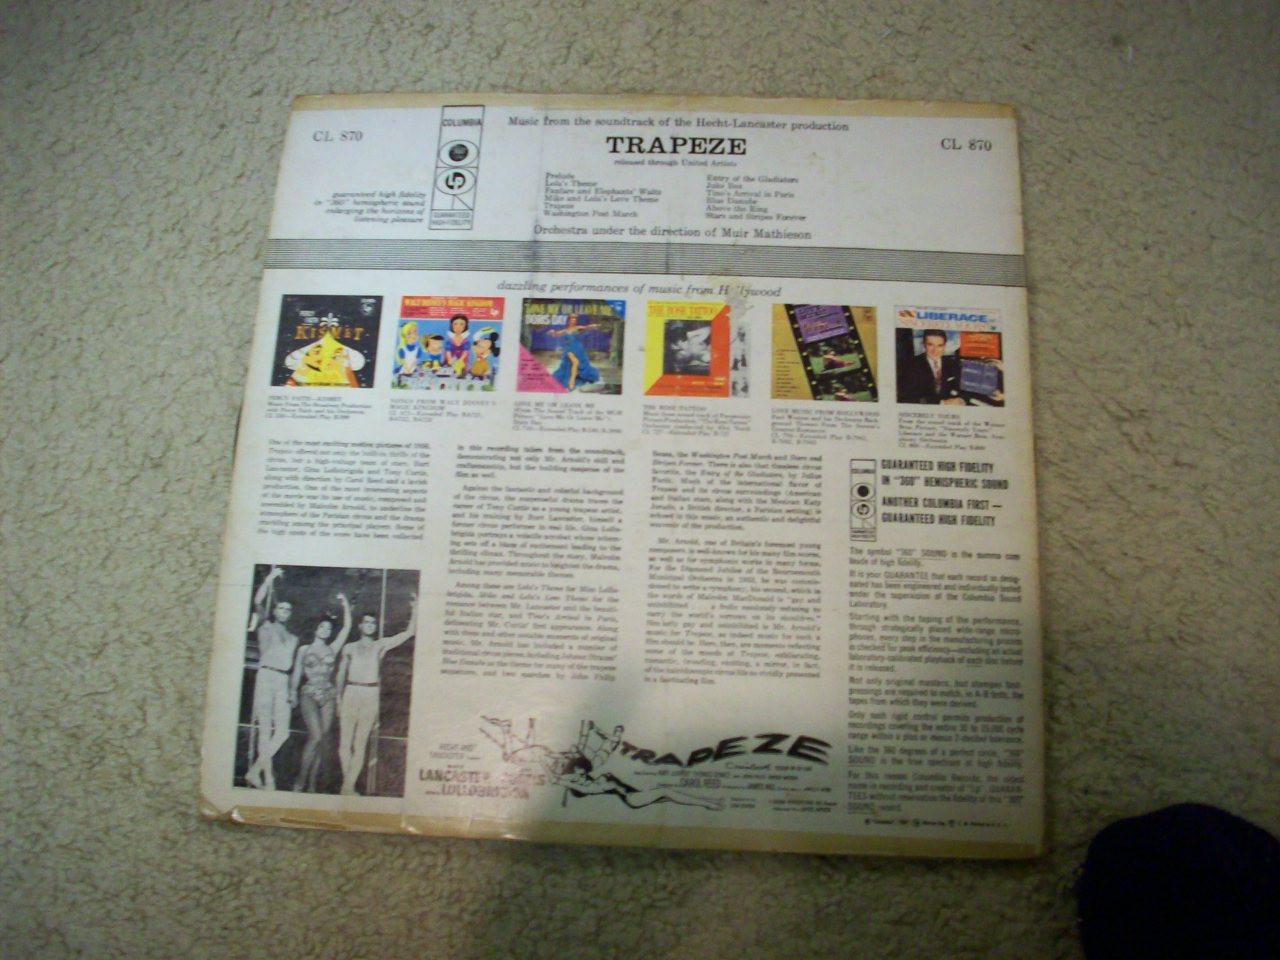 "Lancaster, Burt Tony Curtis Gina Lollobrigida ""Trapeze"" LP 1956 Signed Autograph Color Cover"